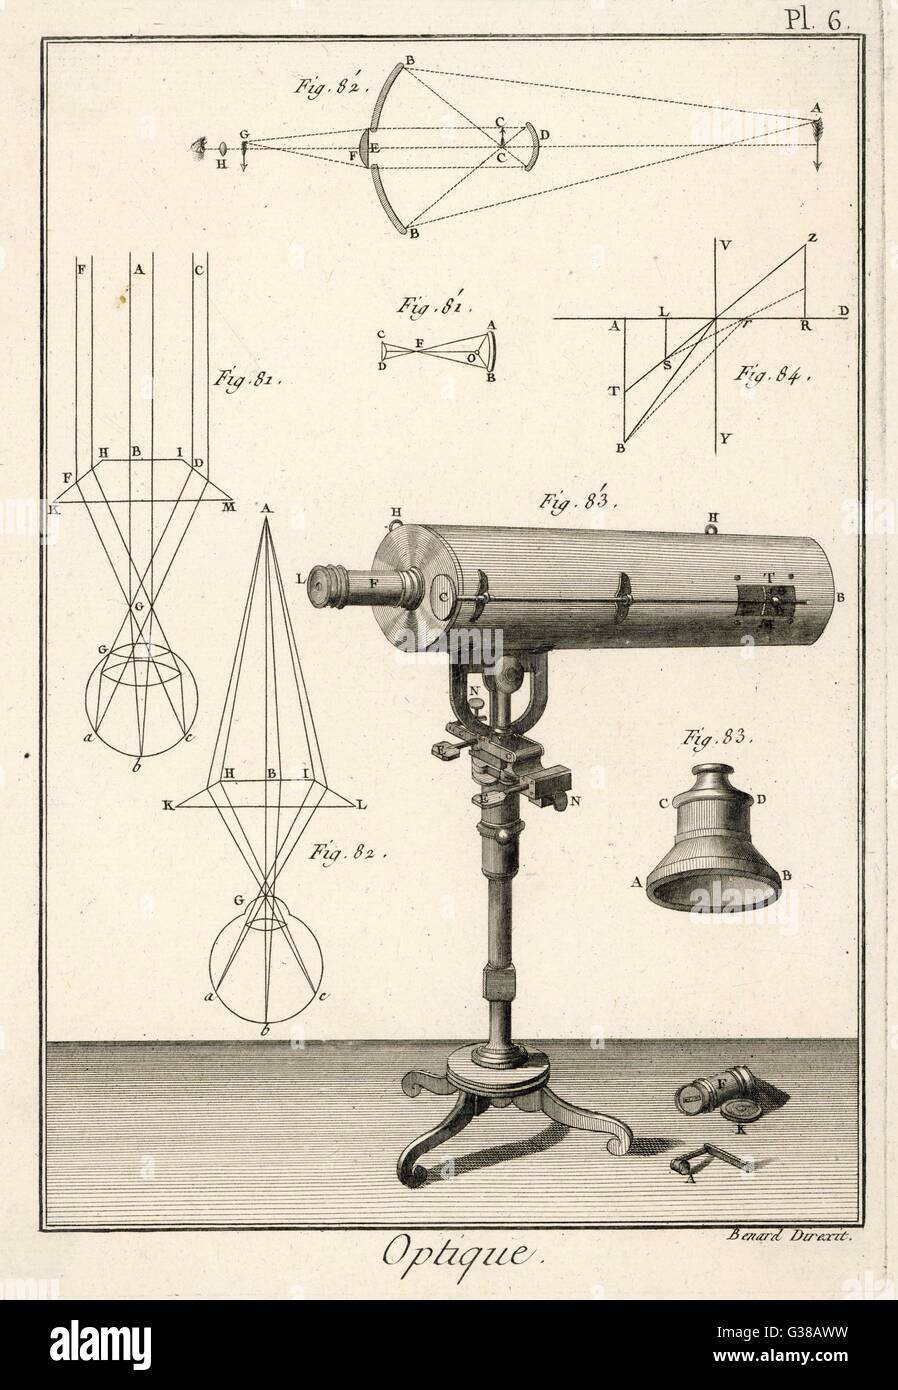 An optique telescope         Date: 1760 - Stock Image